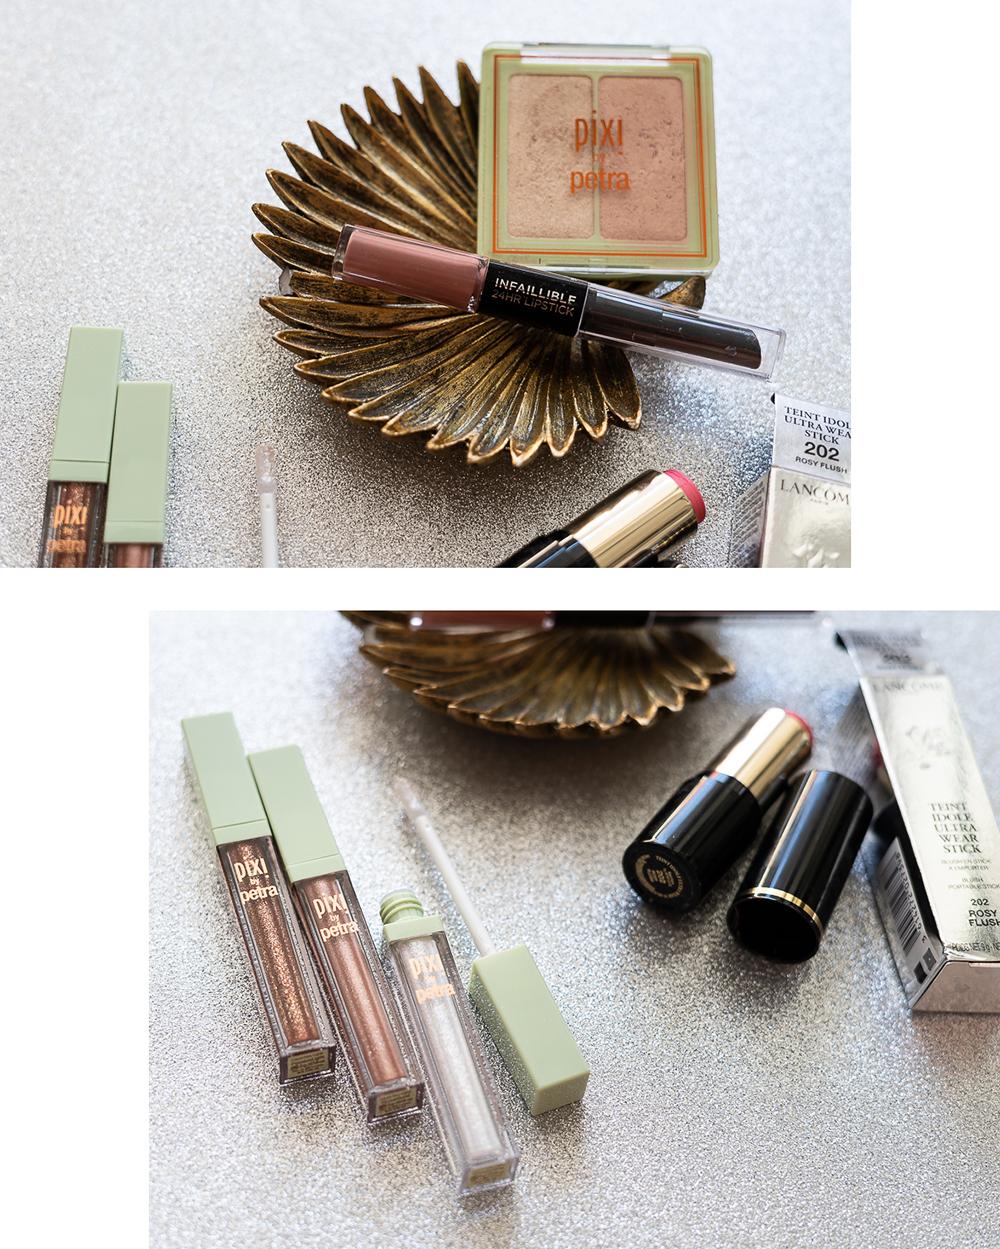 Pixi Liquid Fairy Lights-Glitzer Make-Up-Lancôme Blush Stick-Beautyblog-andysparkles